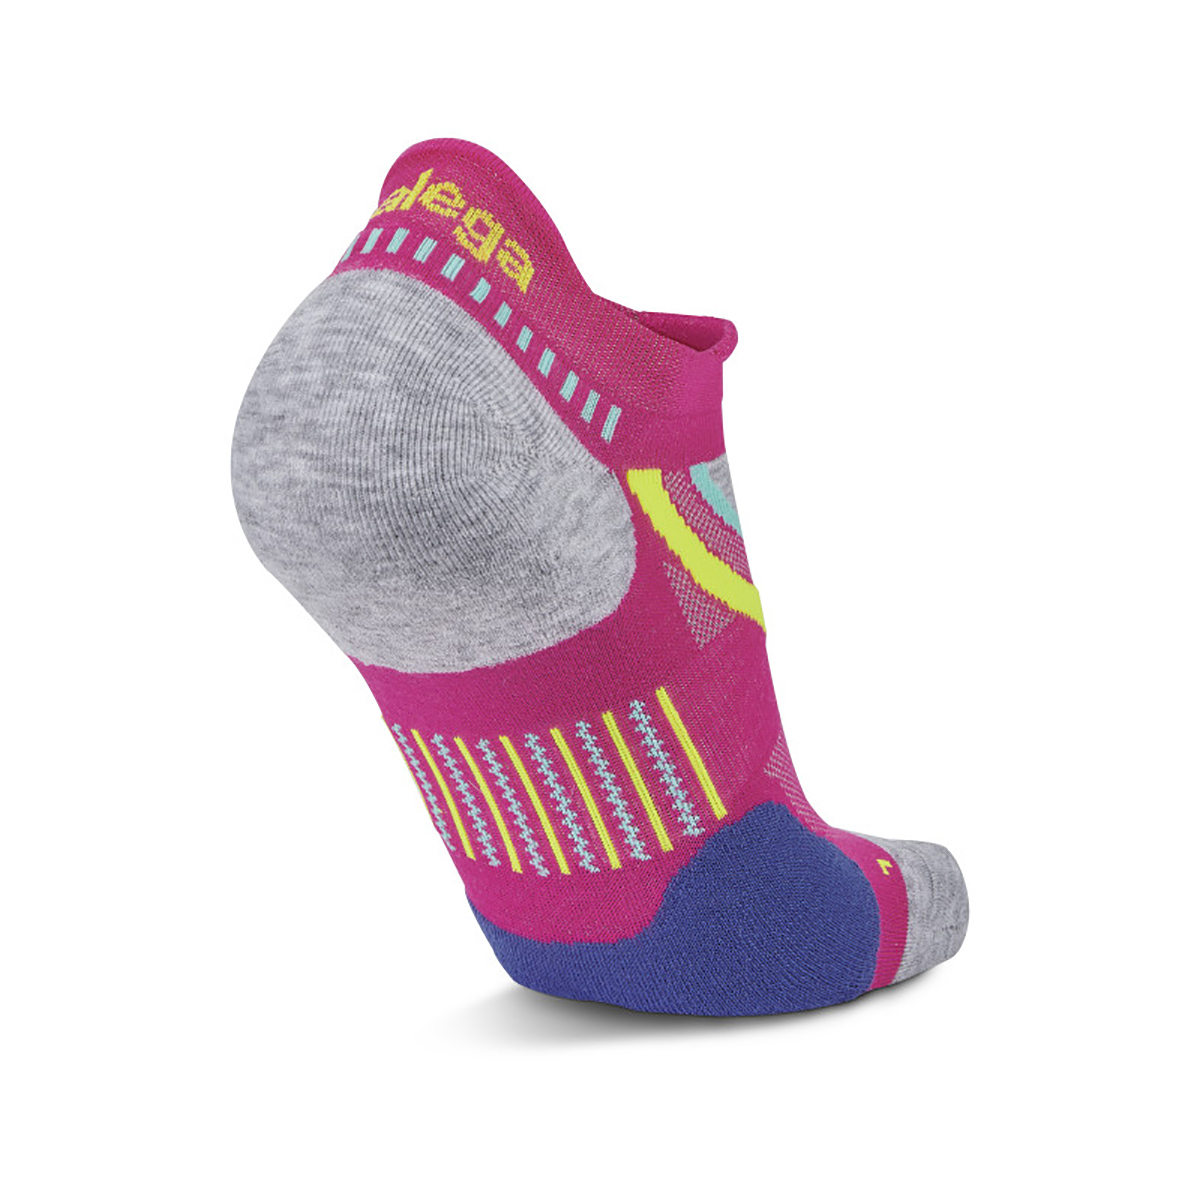 Balega UltraGlide Running Socks - Color: Electric Pink/ Midgrey - Size: S, Electric Pink/ Midgrey, large, image 3